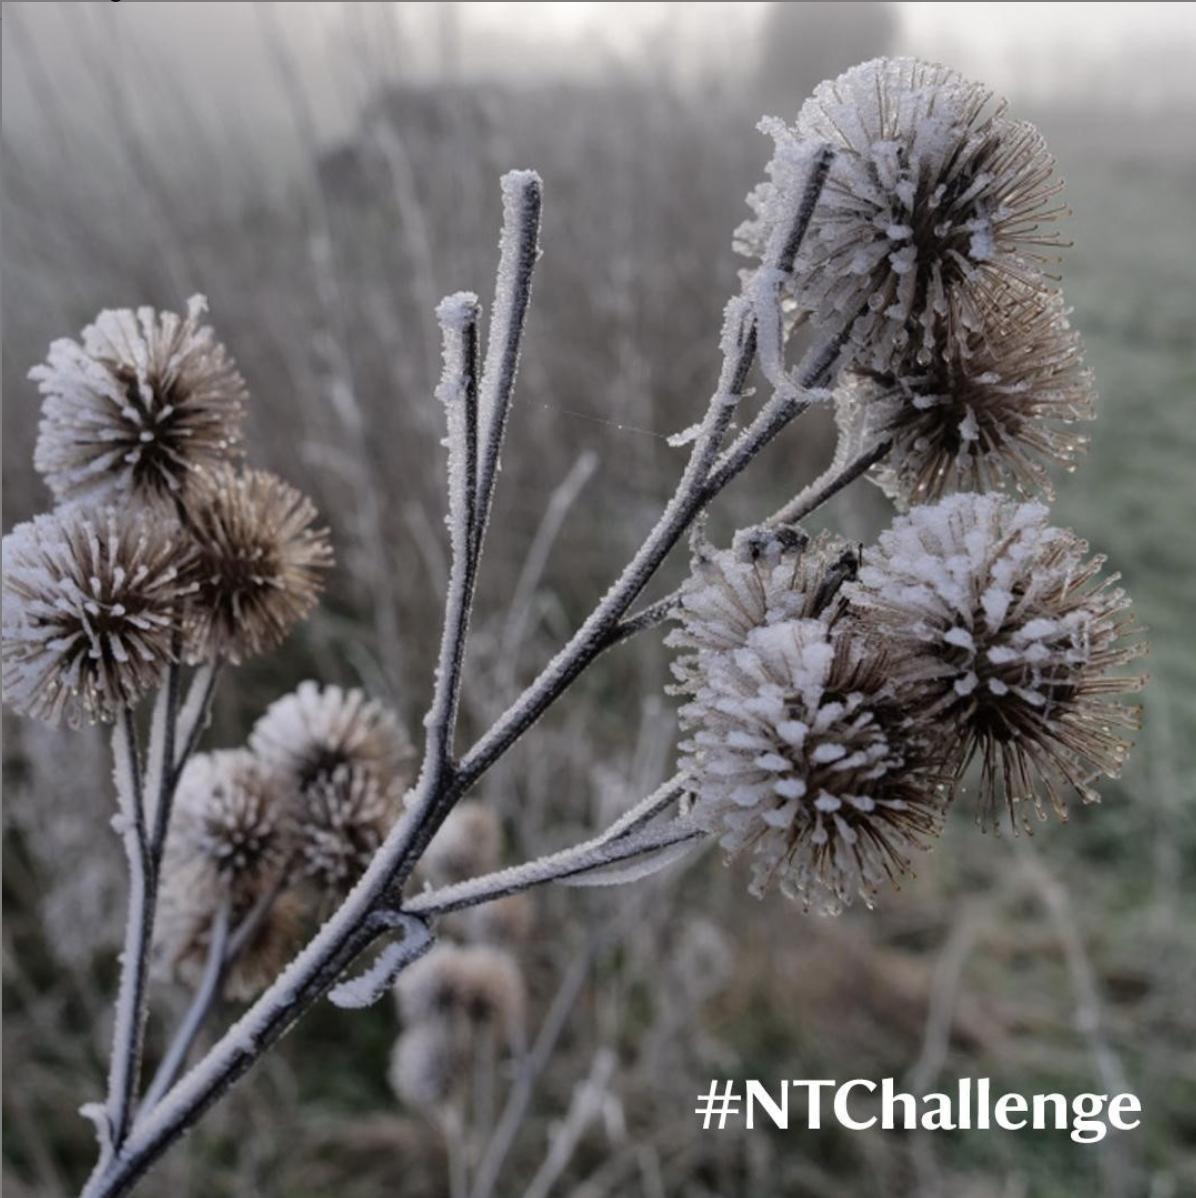 National Trust Challenge